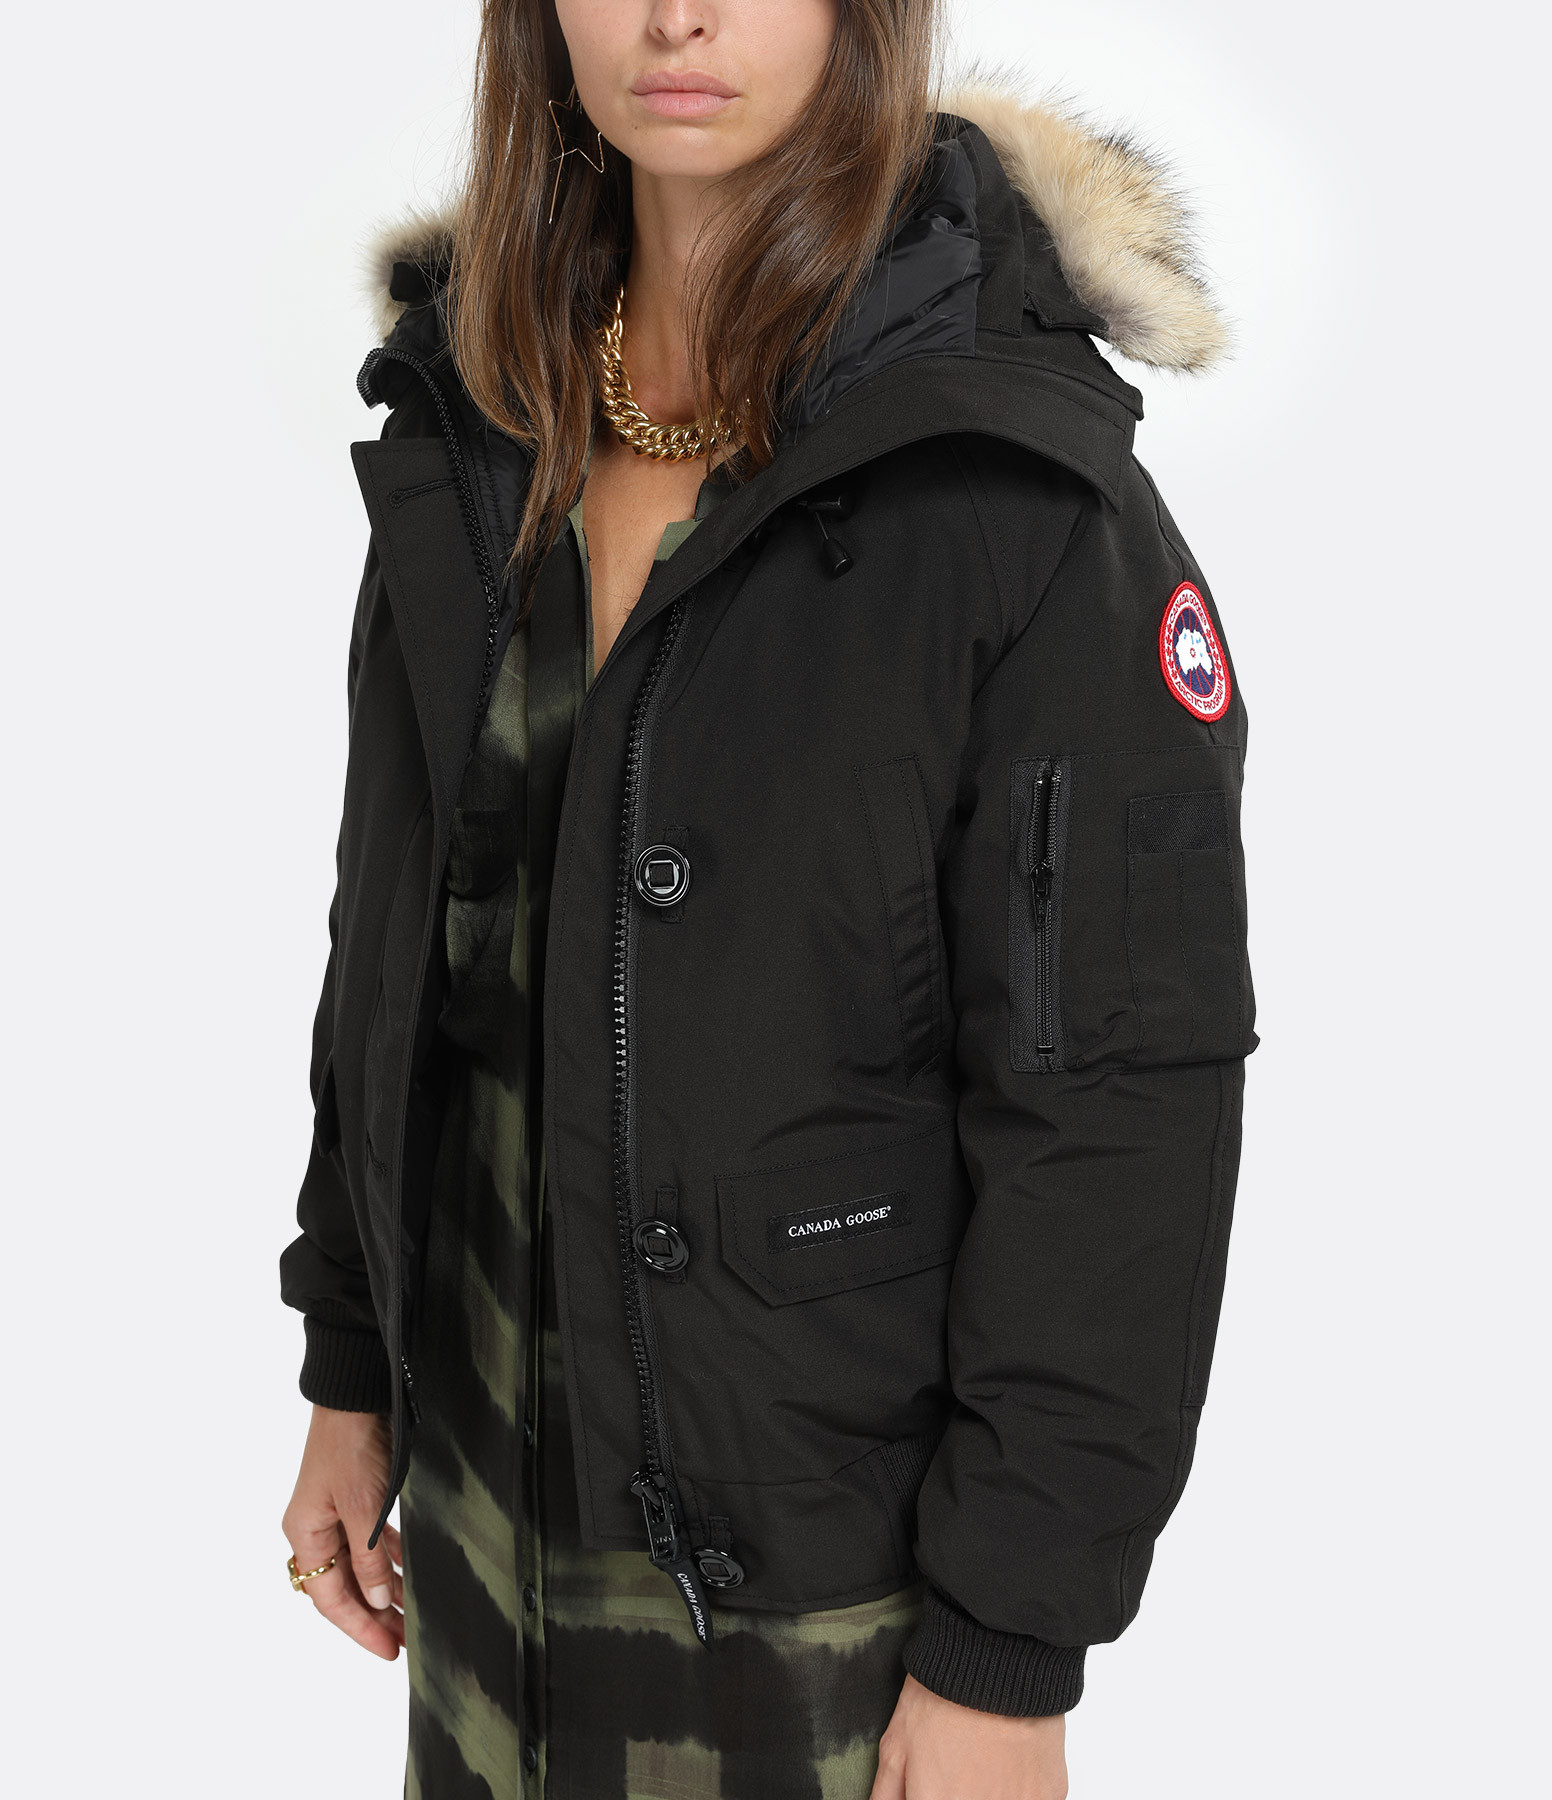 CANADA GOOSE - Veste Bomber Chilliwack Noir